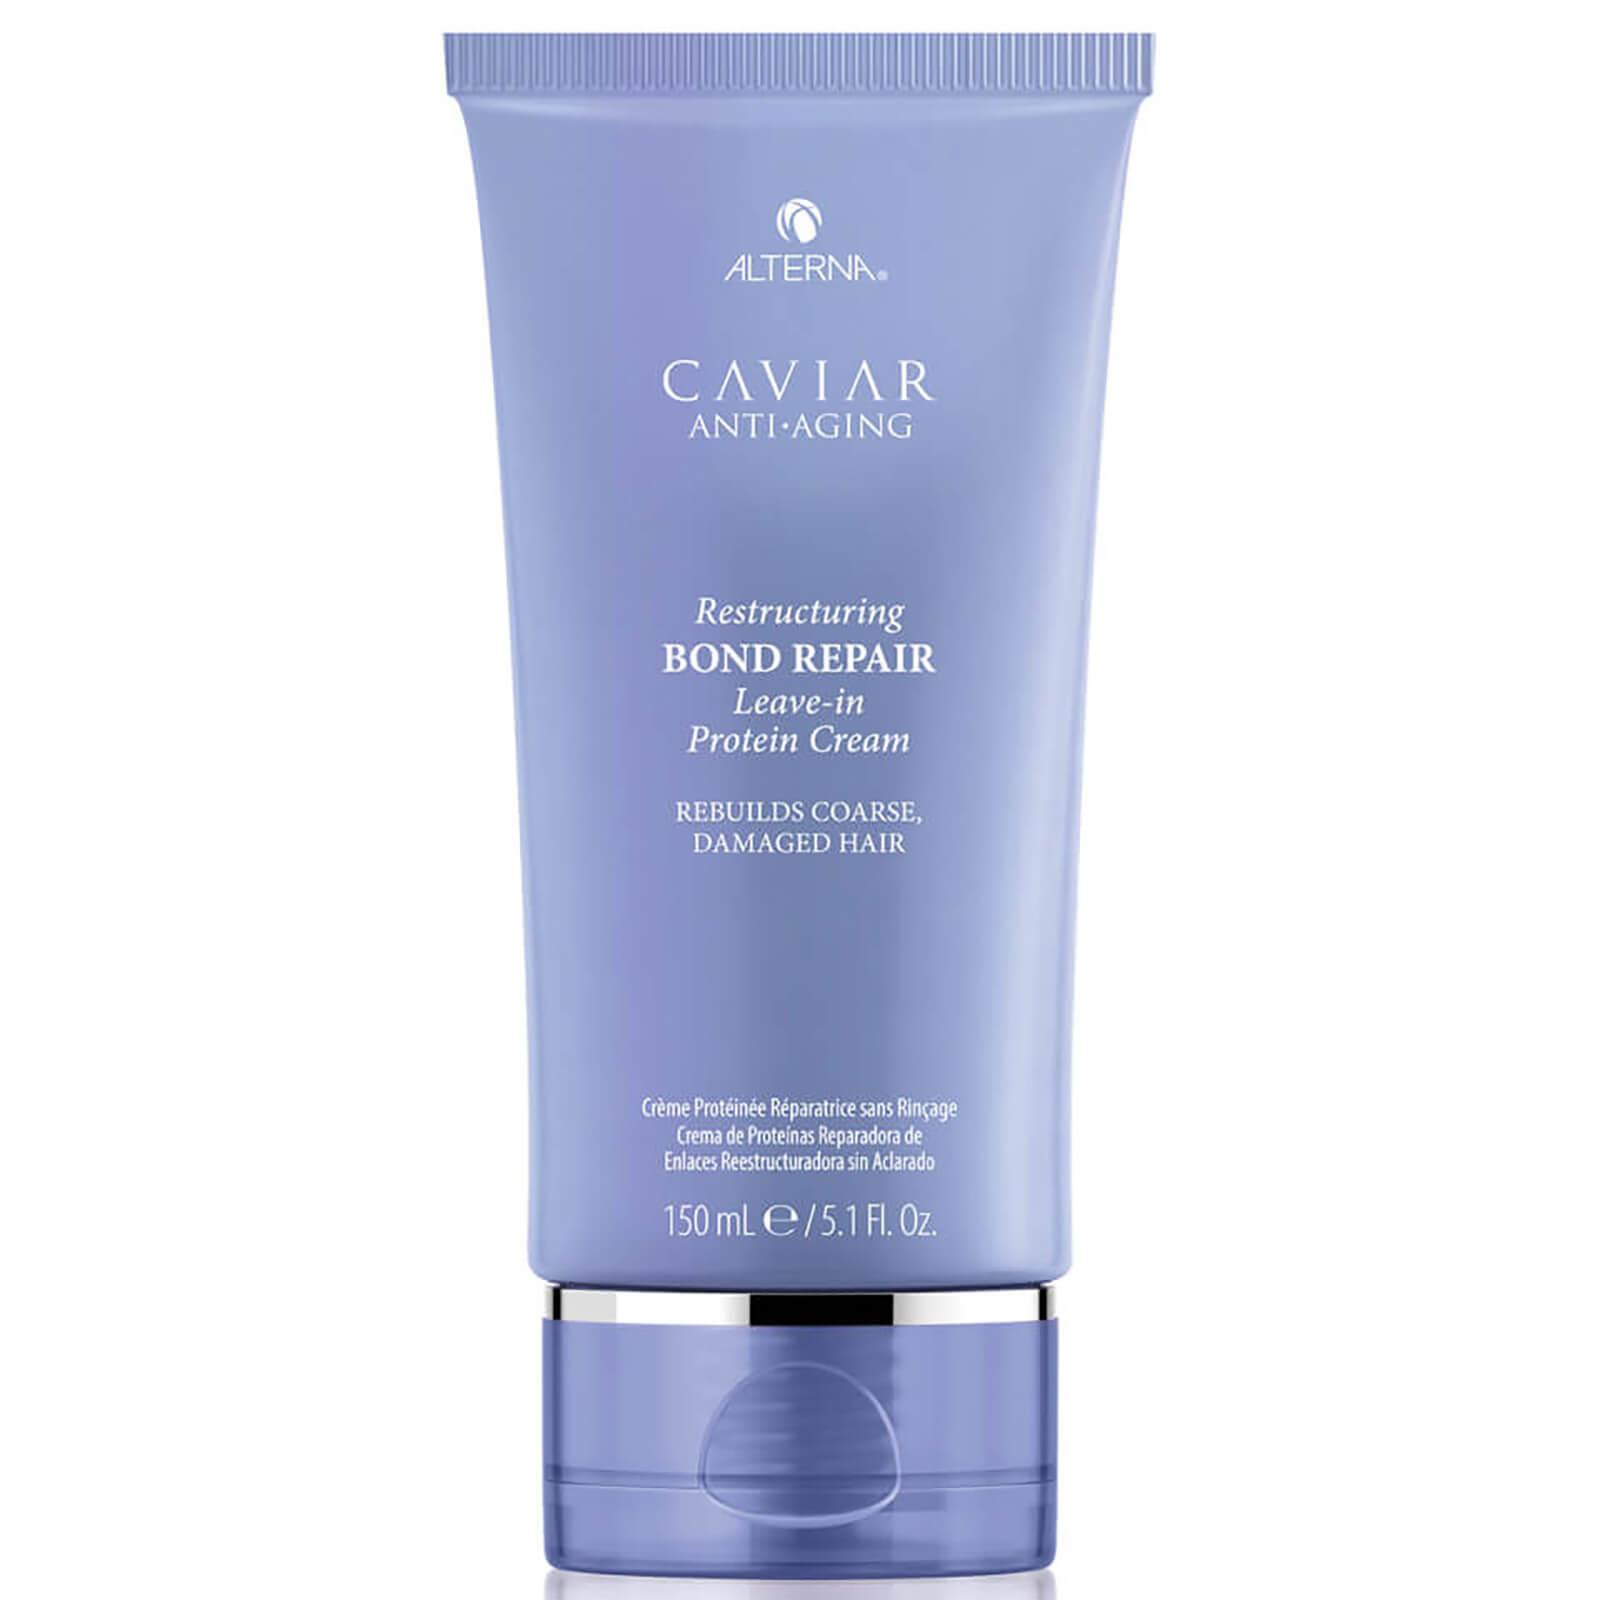 Alterna Caviar Anti-aging Restructuring Bond Repair Leave-in Protein Cream (5.1 Oz.) In Blue